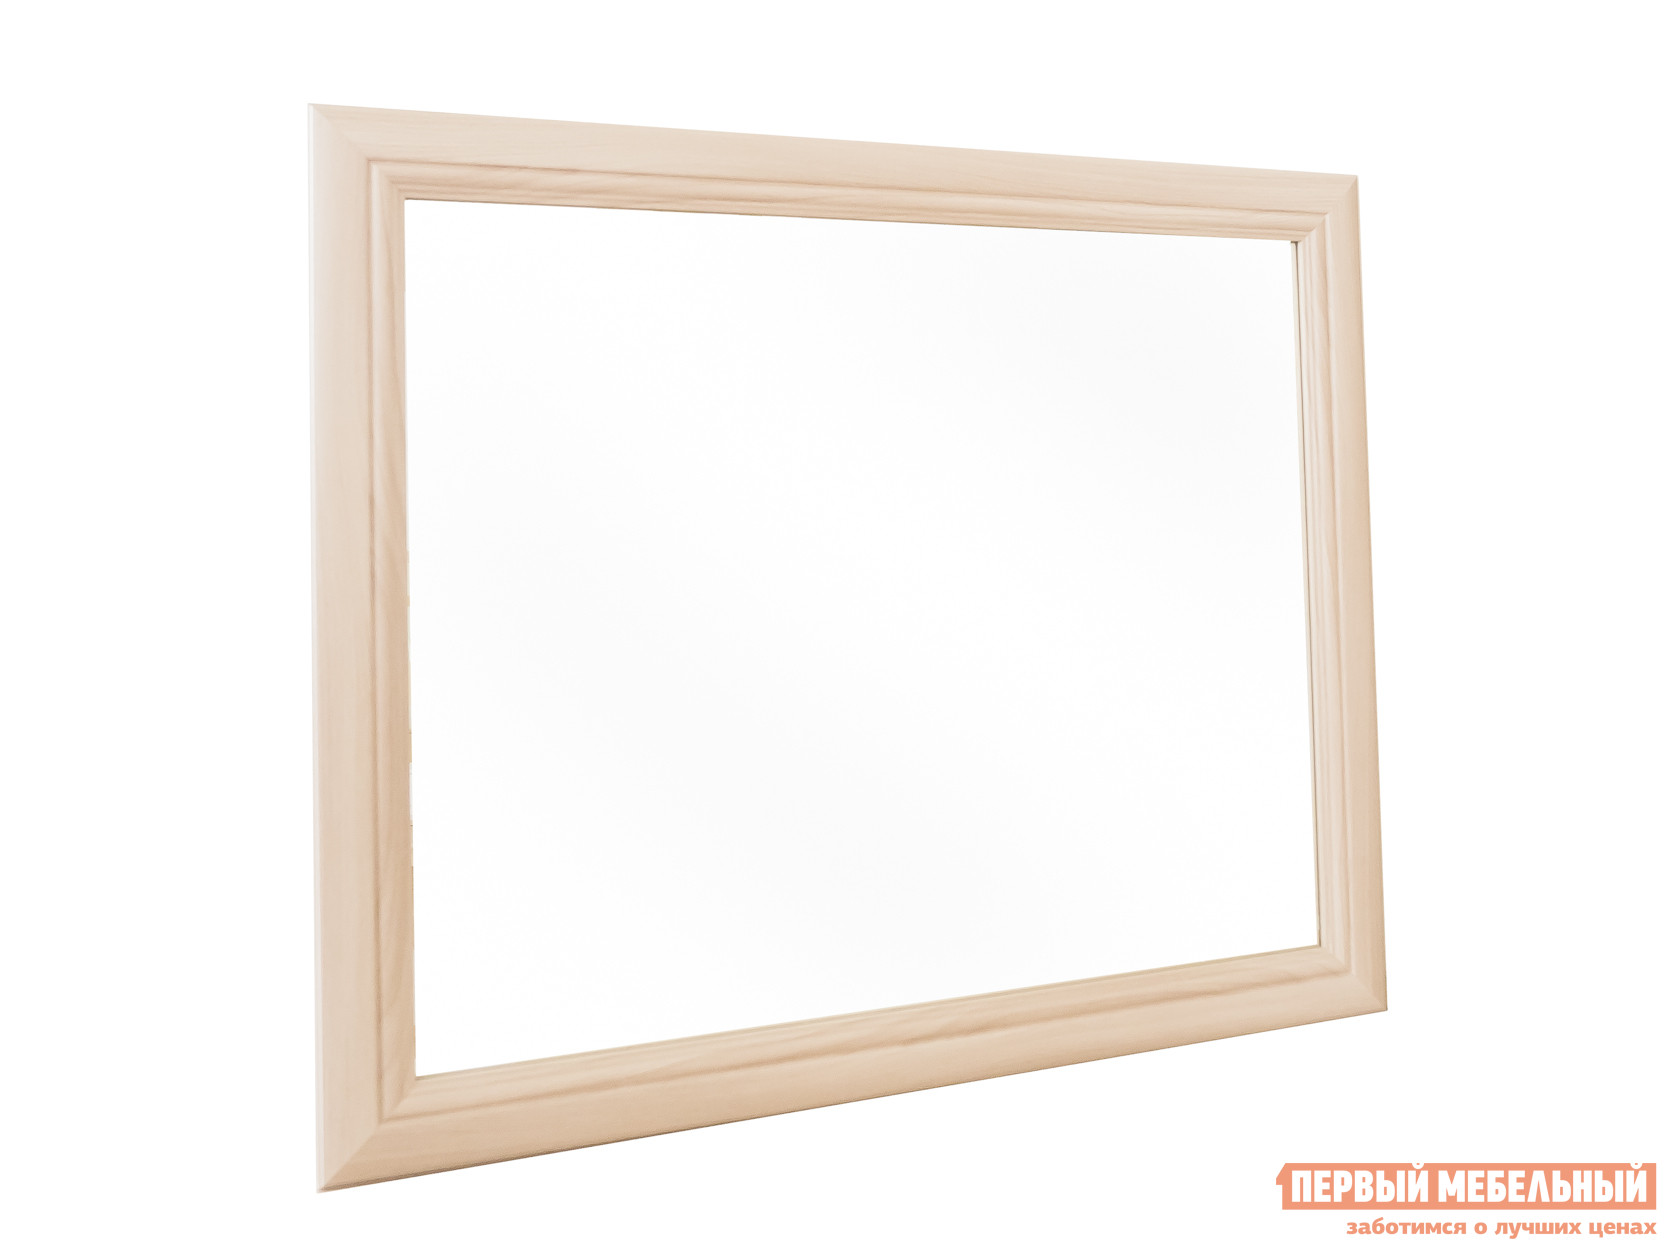 Настенное зеркало Боровичи Лотос 12.05